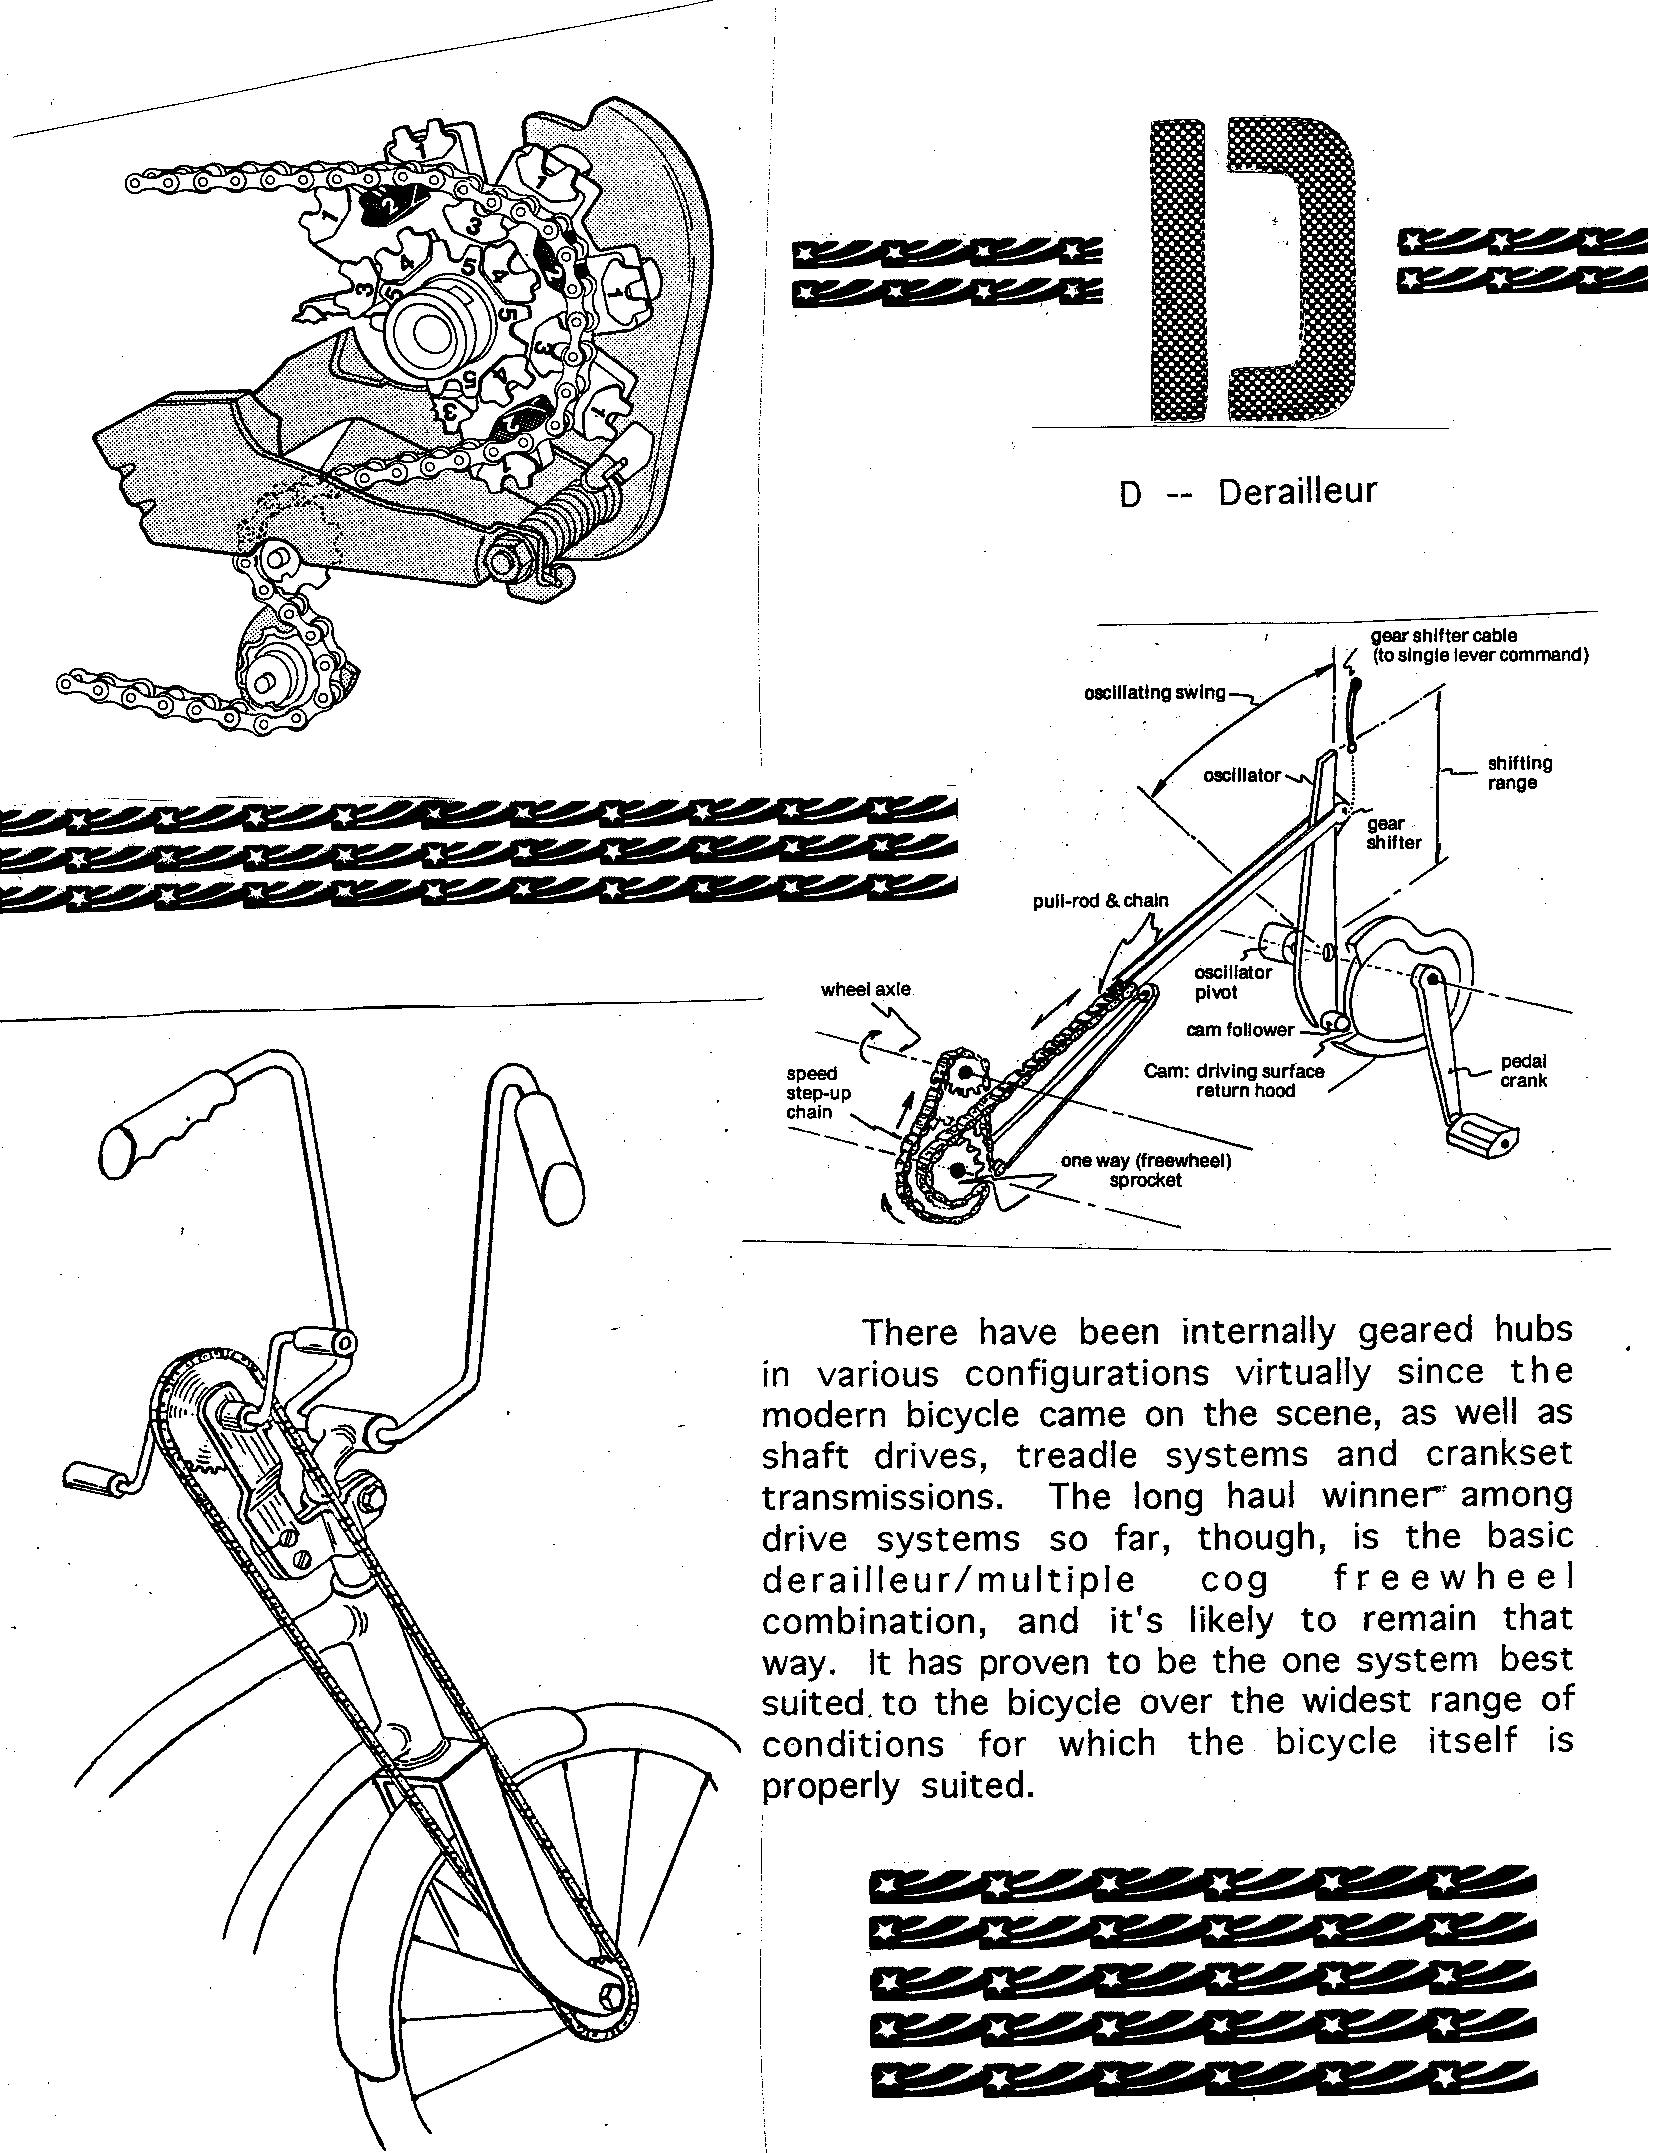 8 Compton Bicycle ABC - D1.jpg